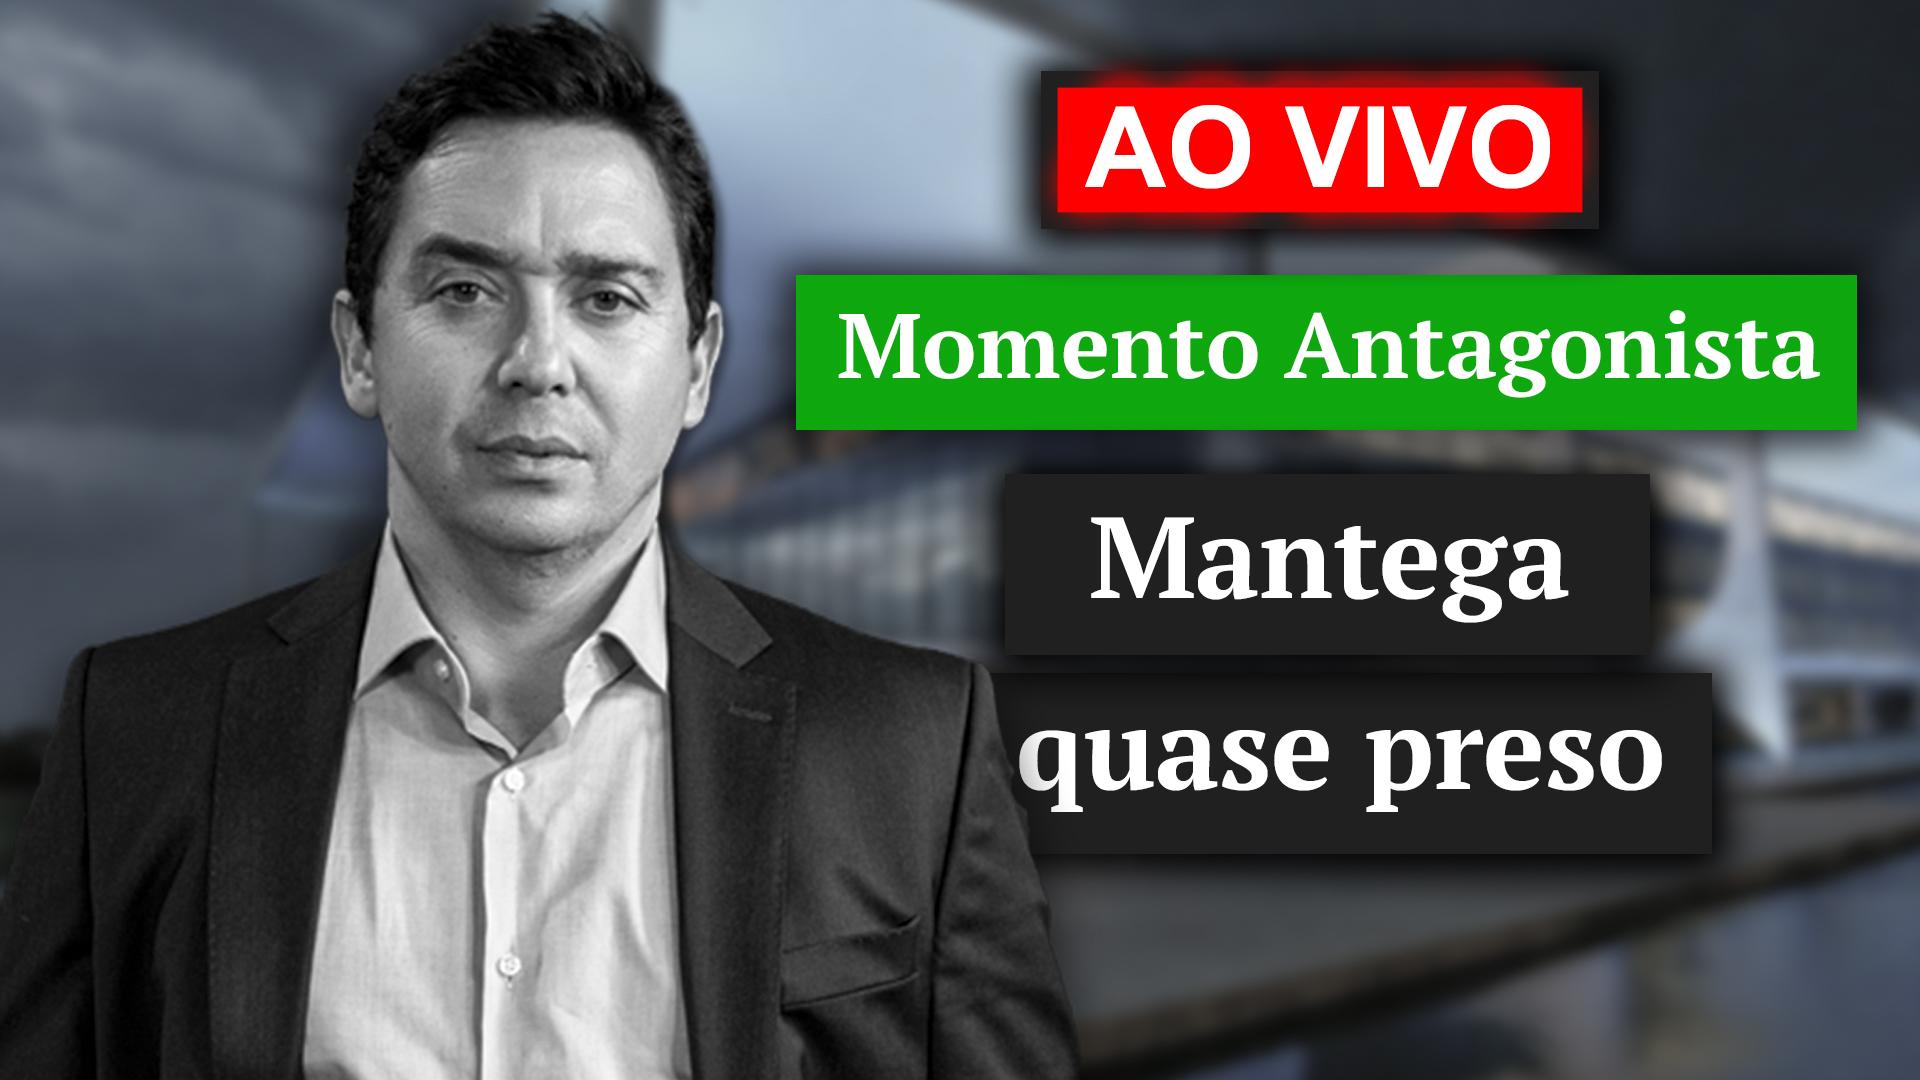 AO VIVO – Momento Antagonista: Mantega quase preso